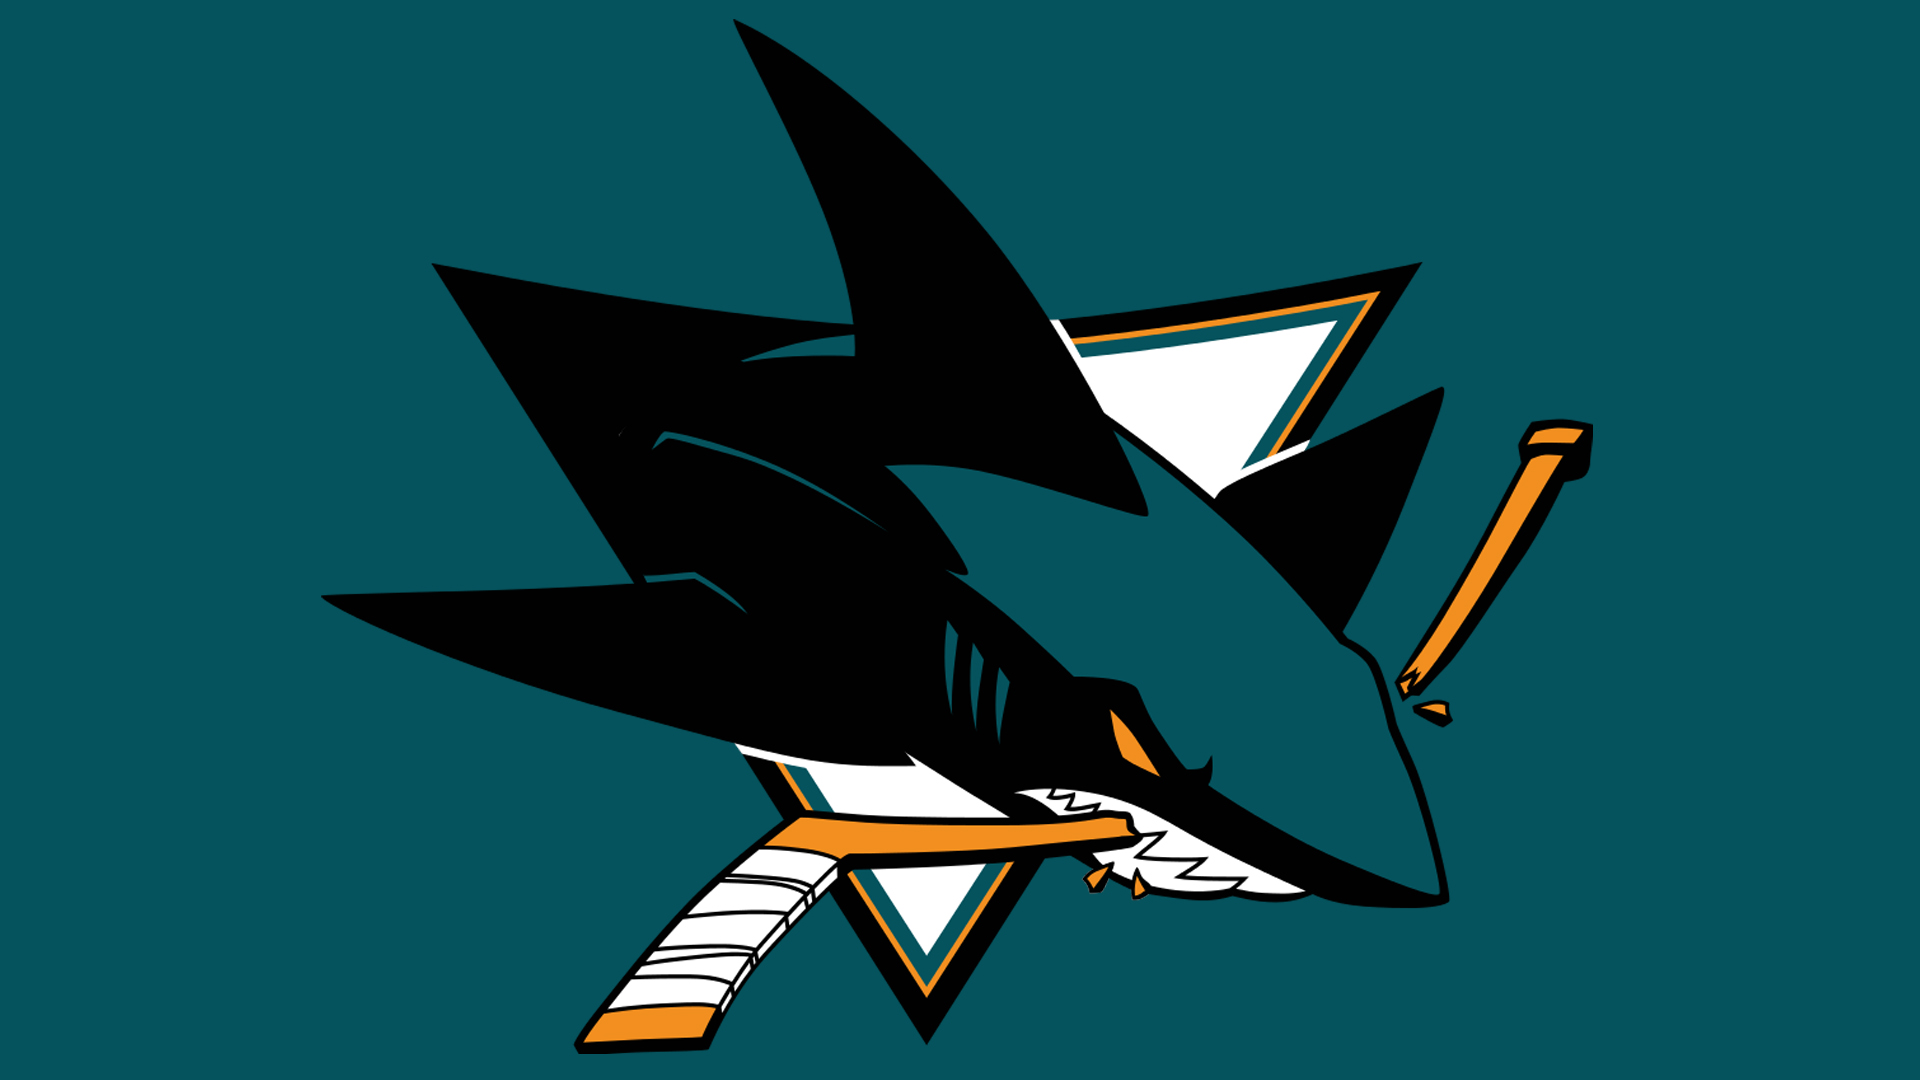 Meaning San Jose Sharks logo and symbol.